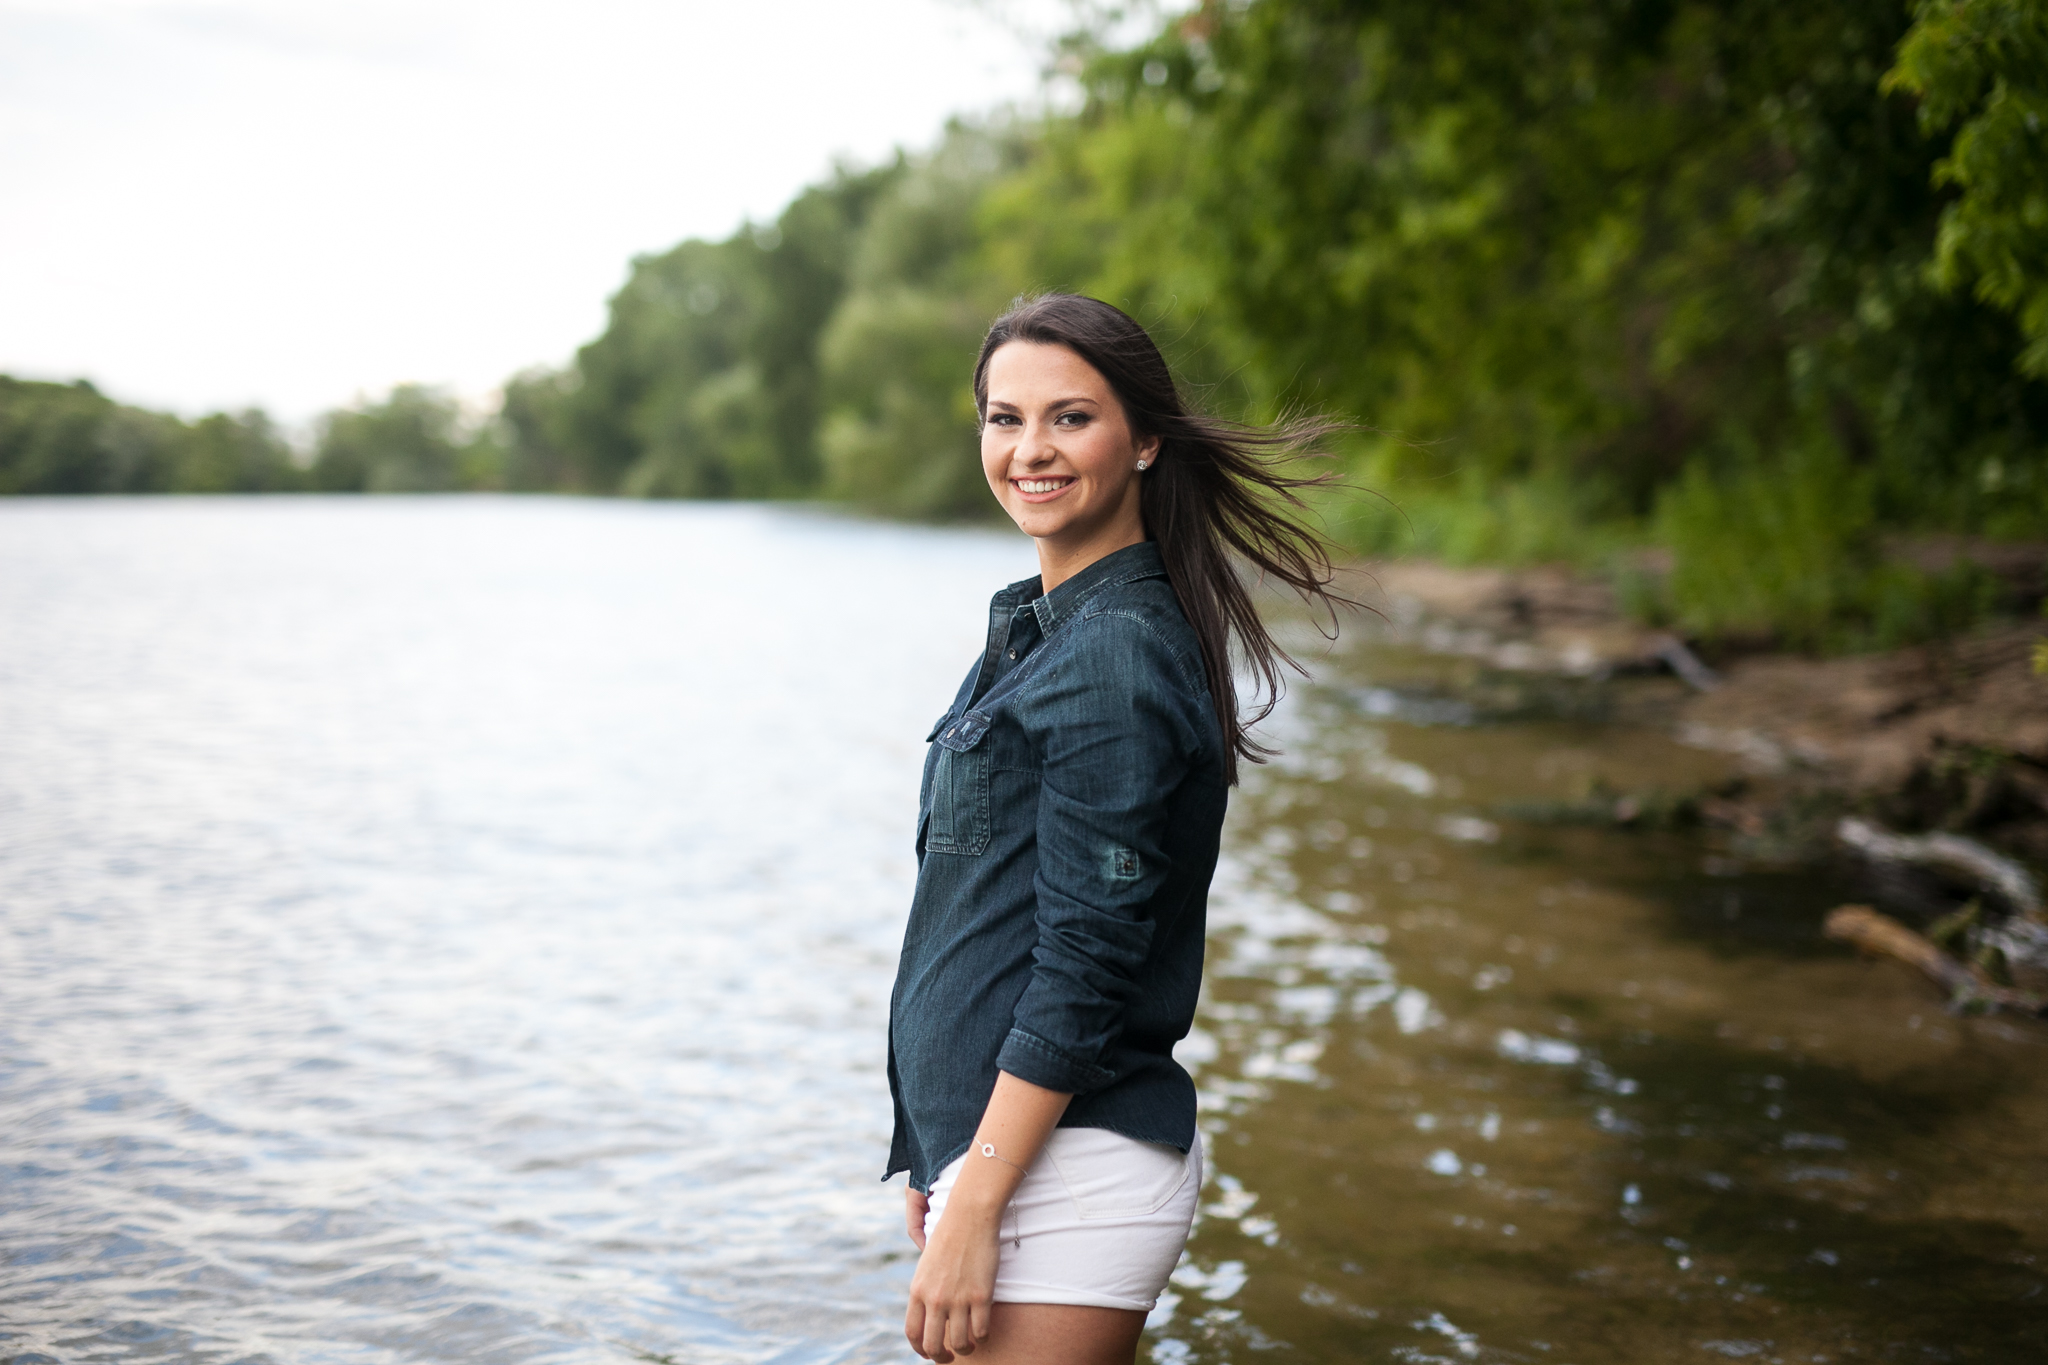 Madison_Wisconsin_Senior_Portrait_008.jpg